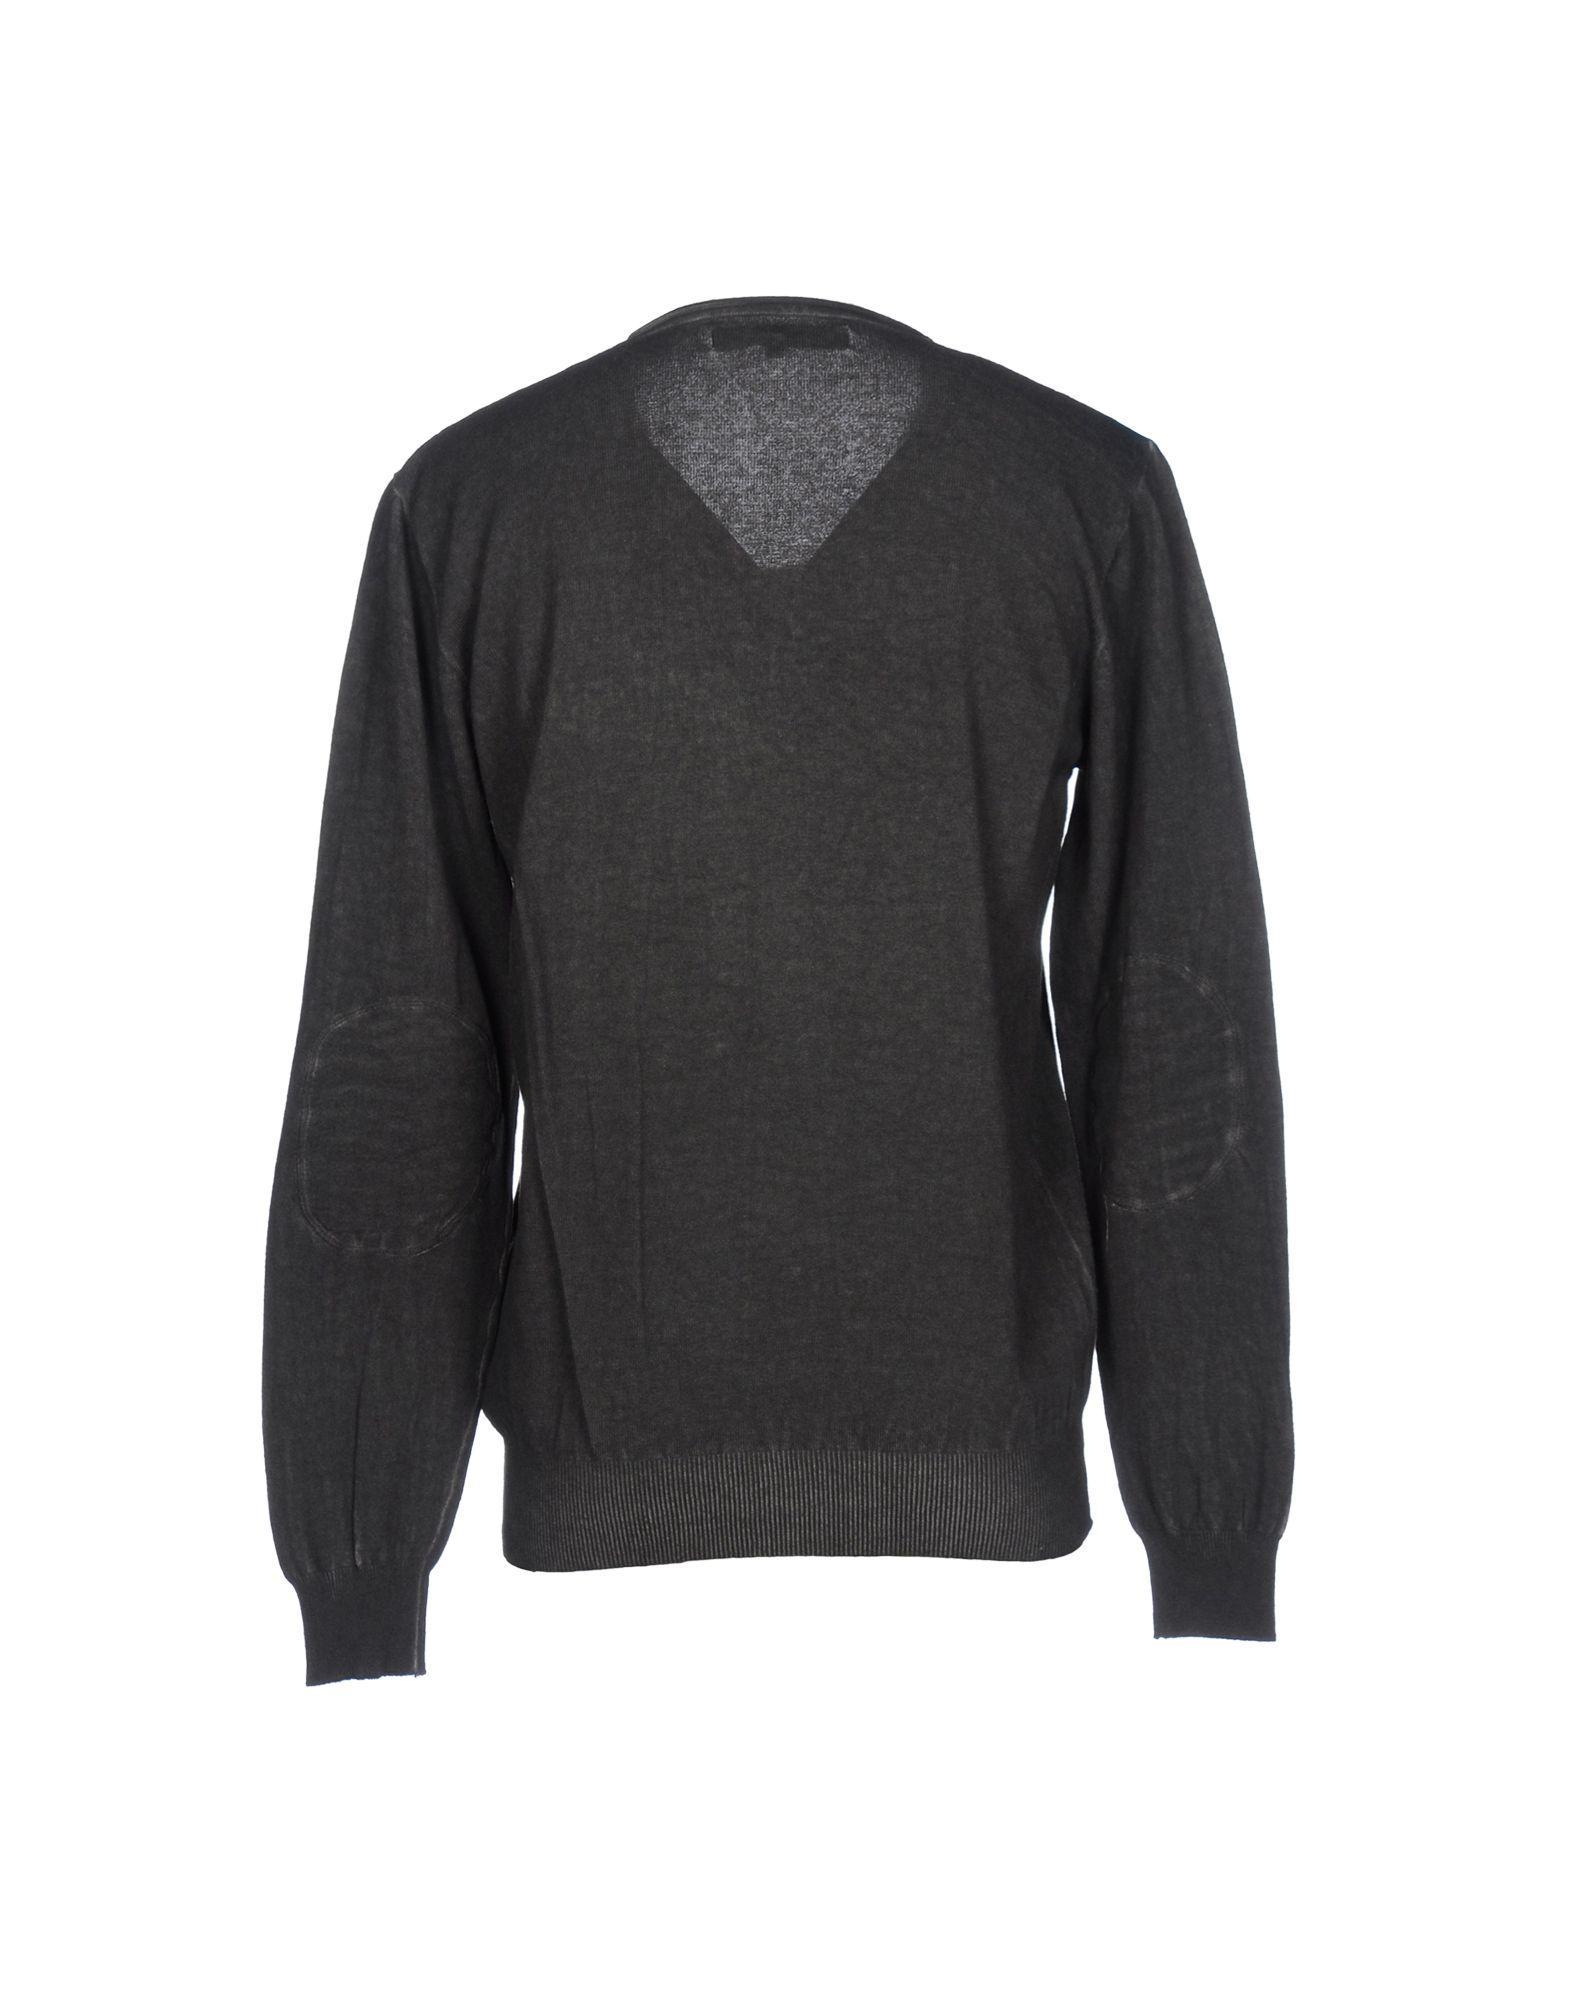 Clark Jeans Cotton Sweater in Lead (Grey) for Men